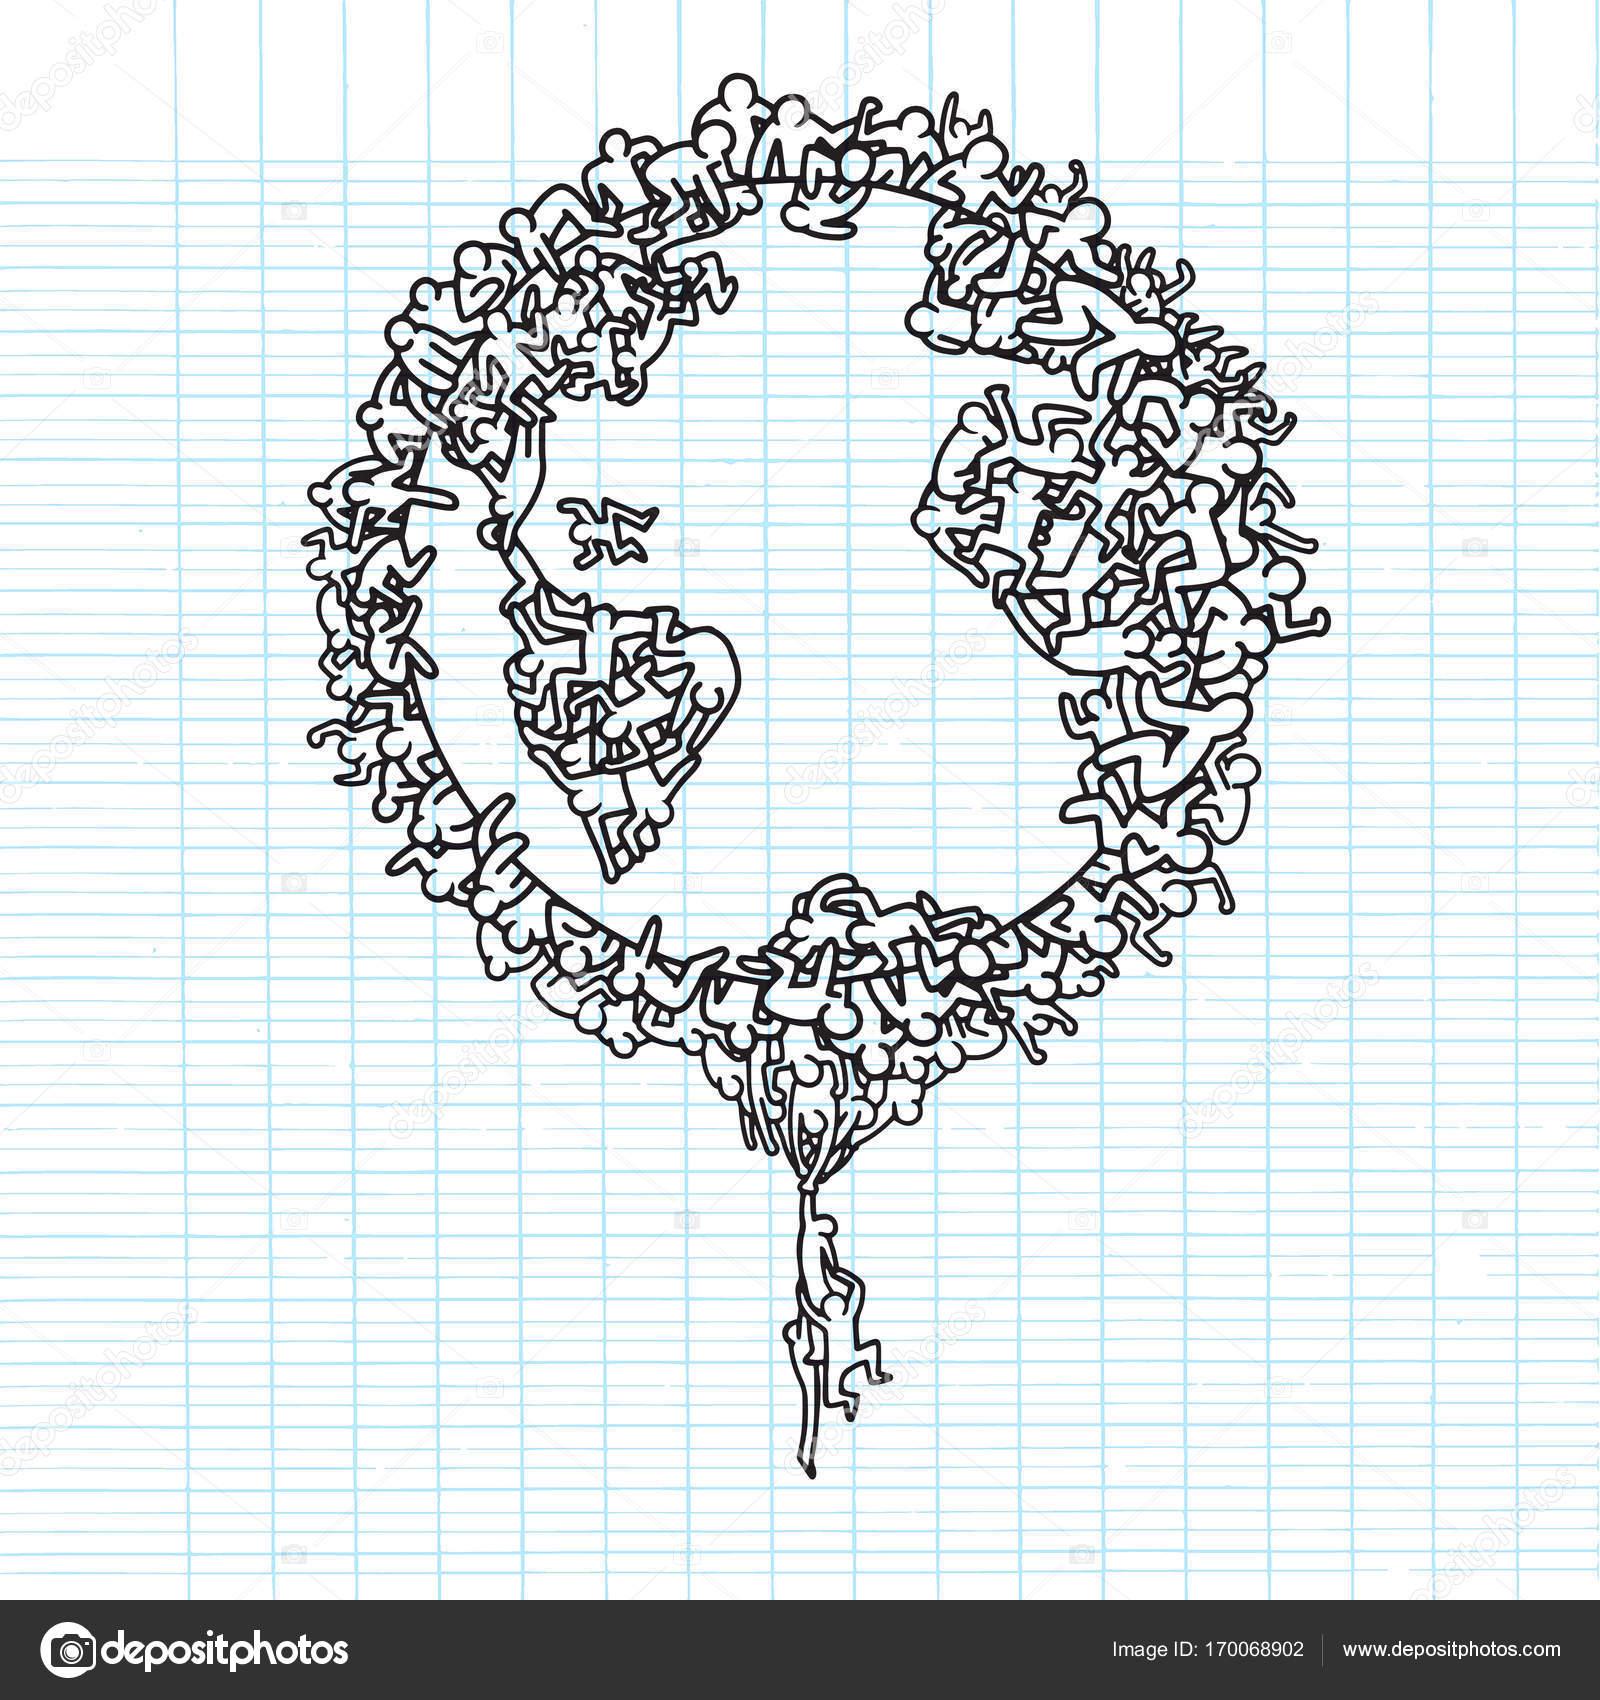 Rucne Kreslene Vektorove Ilustrace Zeme Sveta S Lidmi Illustrator